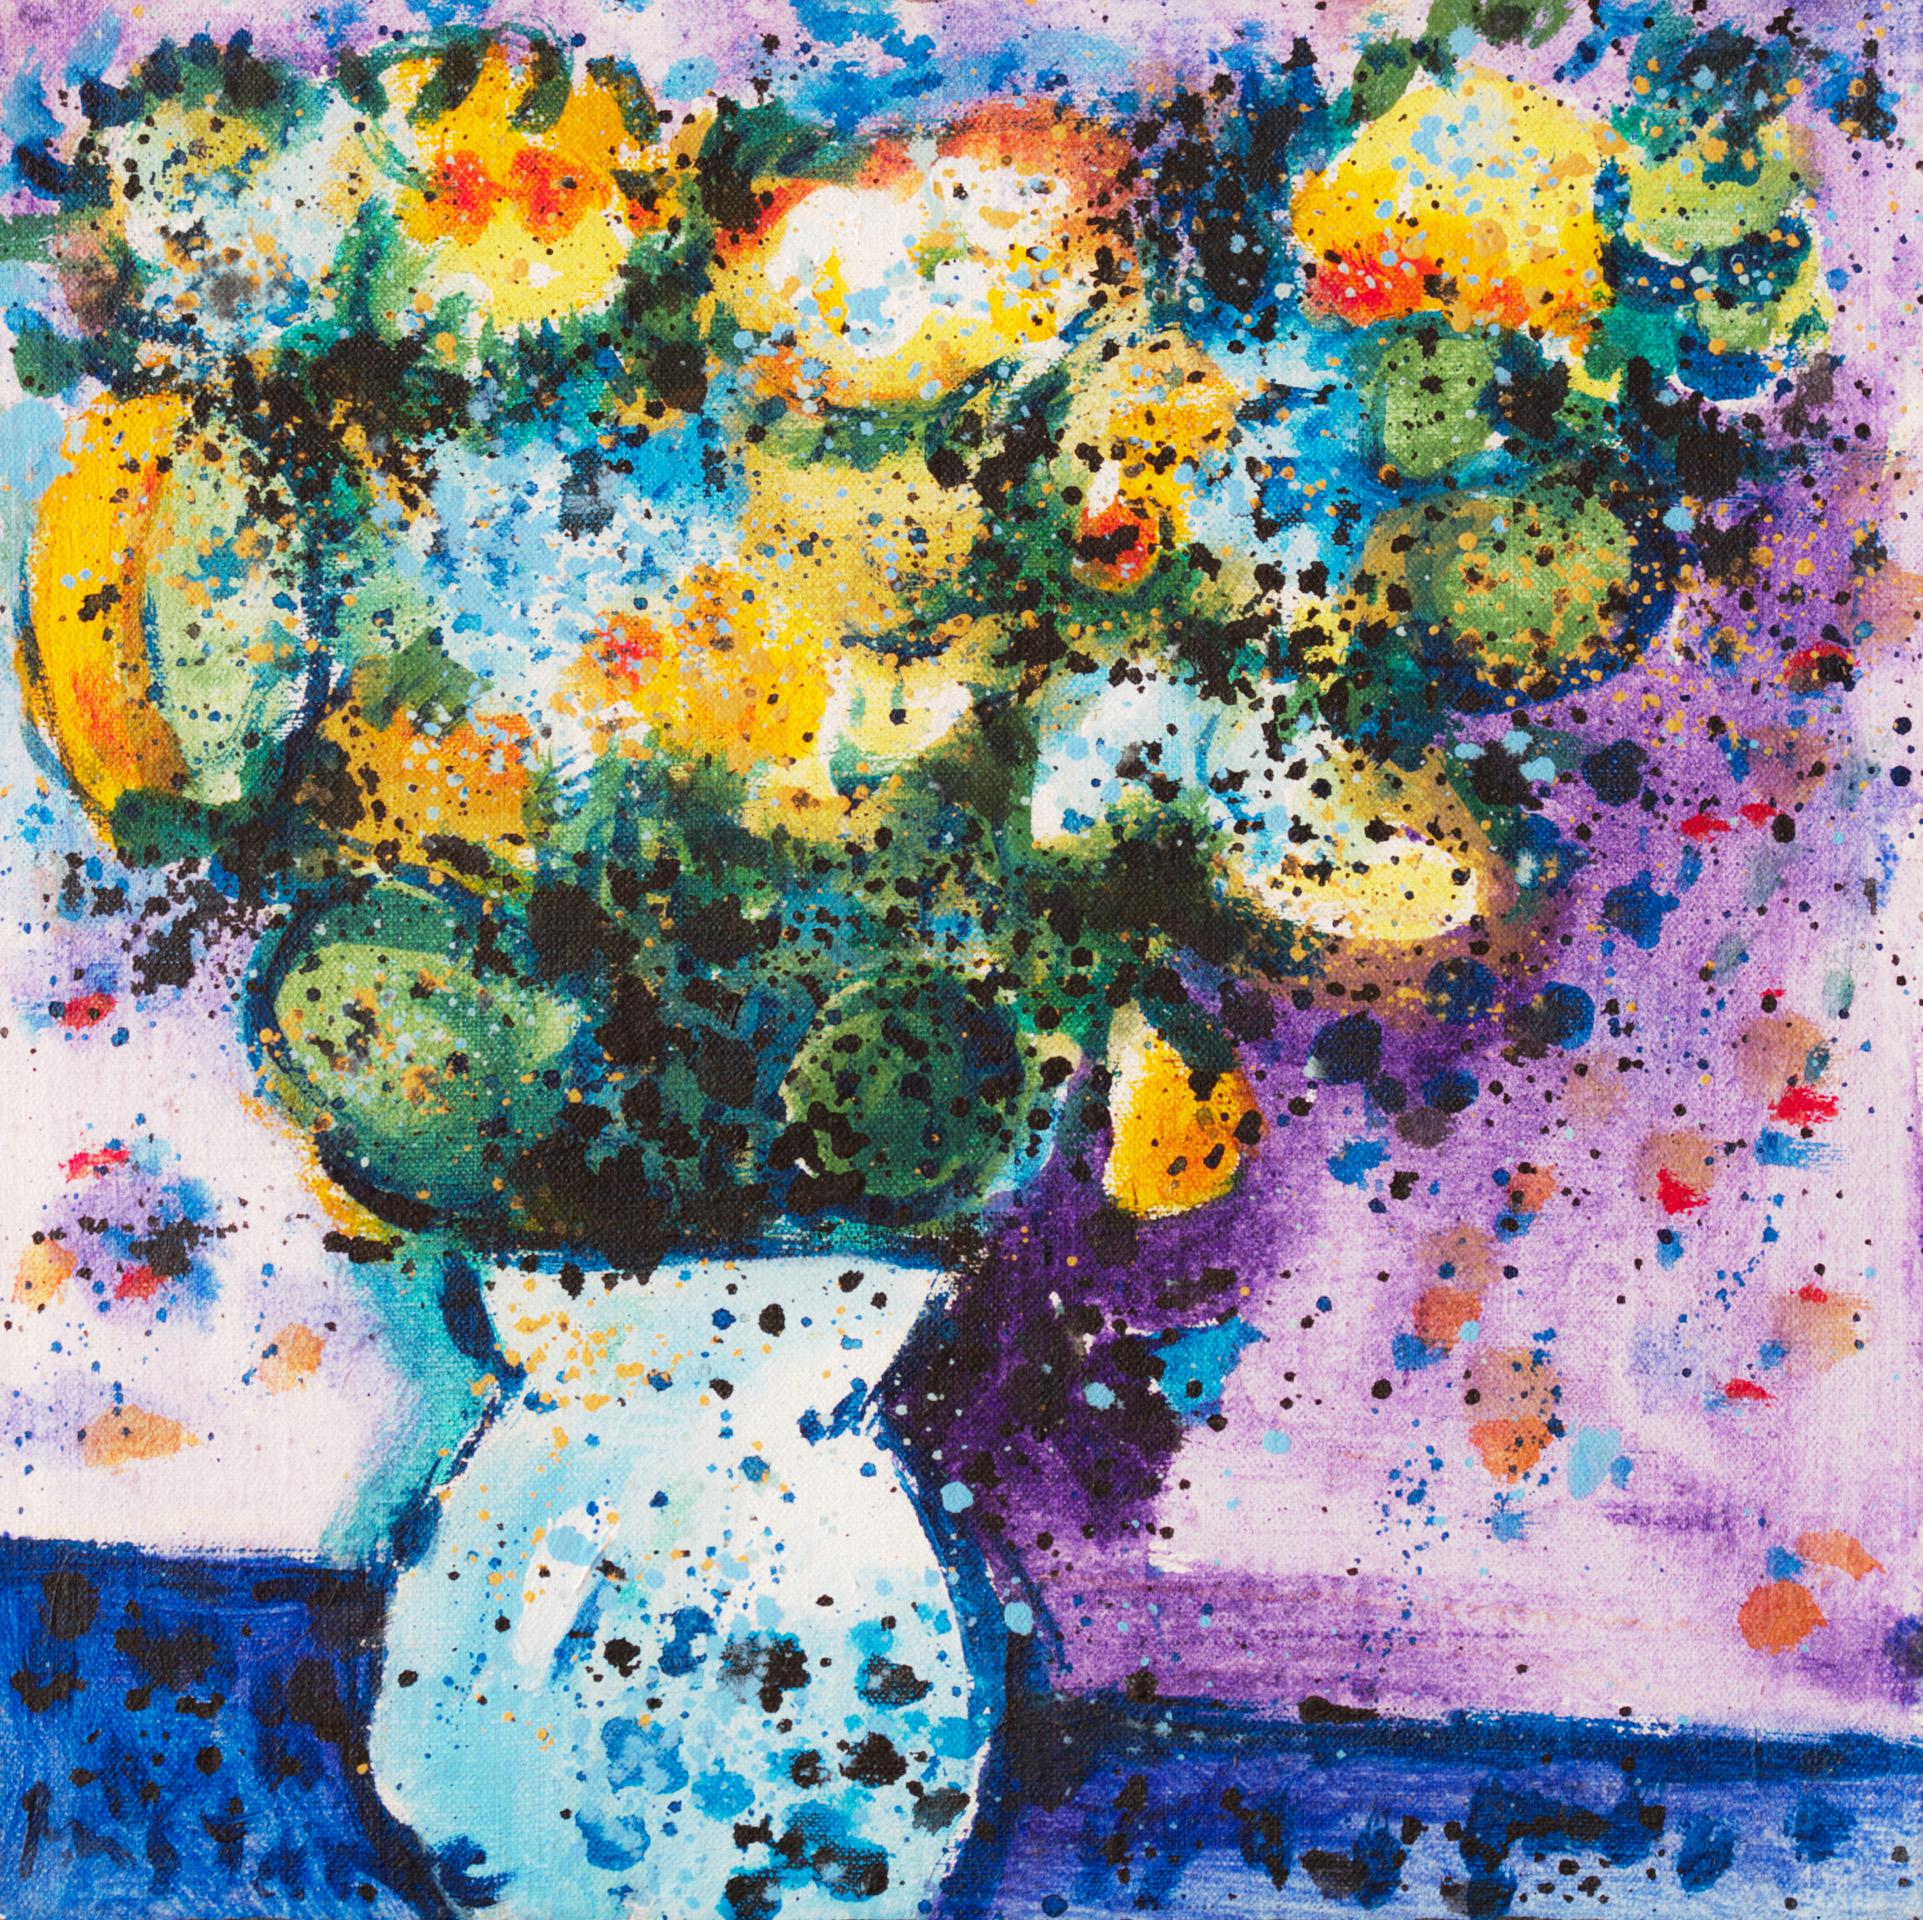 Still Life II  /  1989 / oil on canvas / 30x30 cm